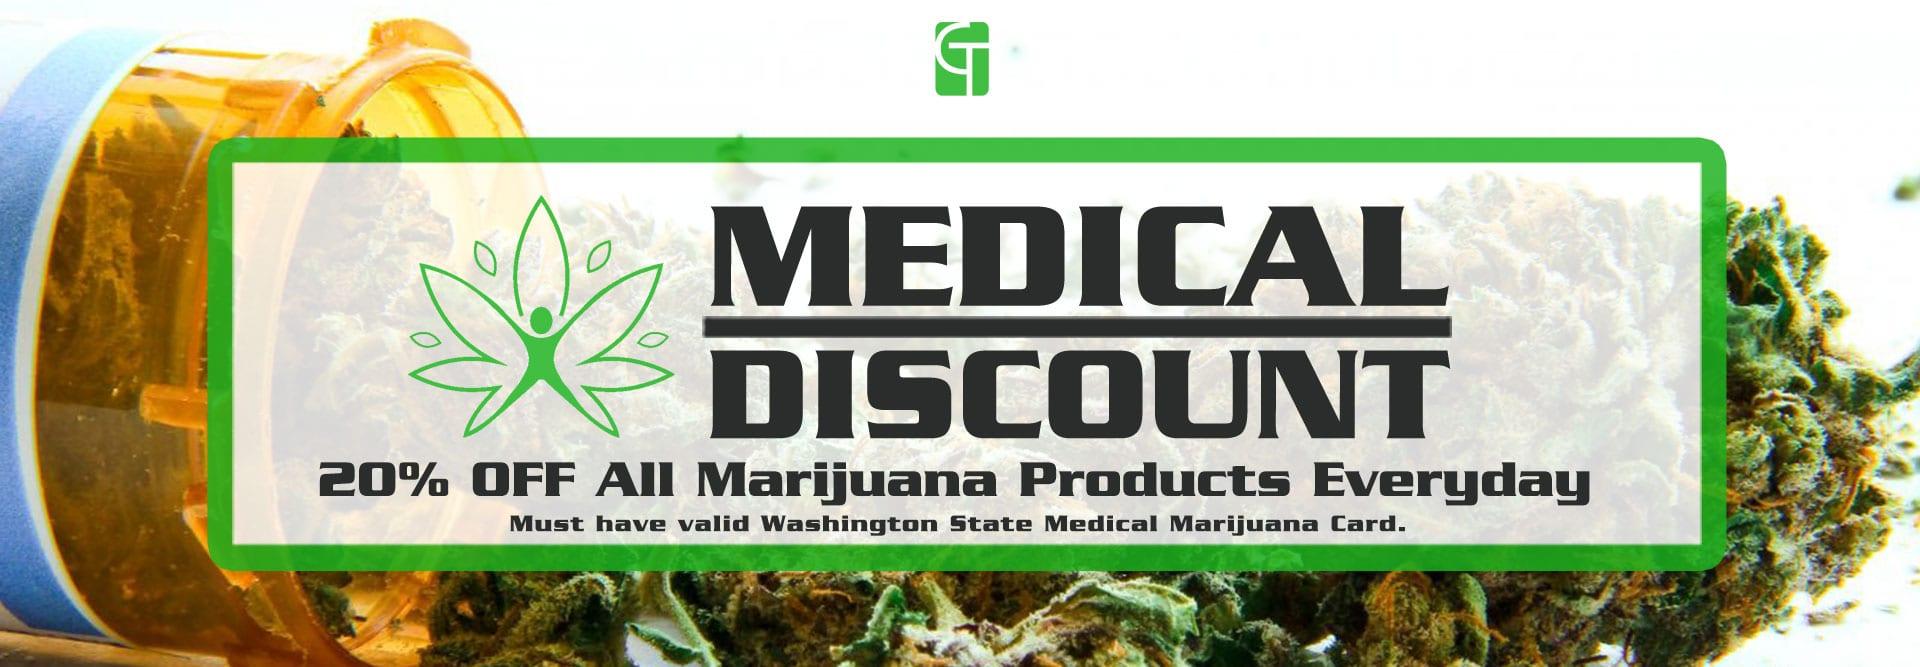 medical-discount-bellevue-cannabis-marijuana